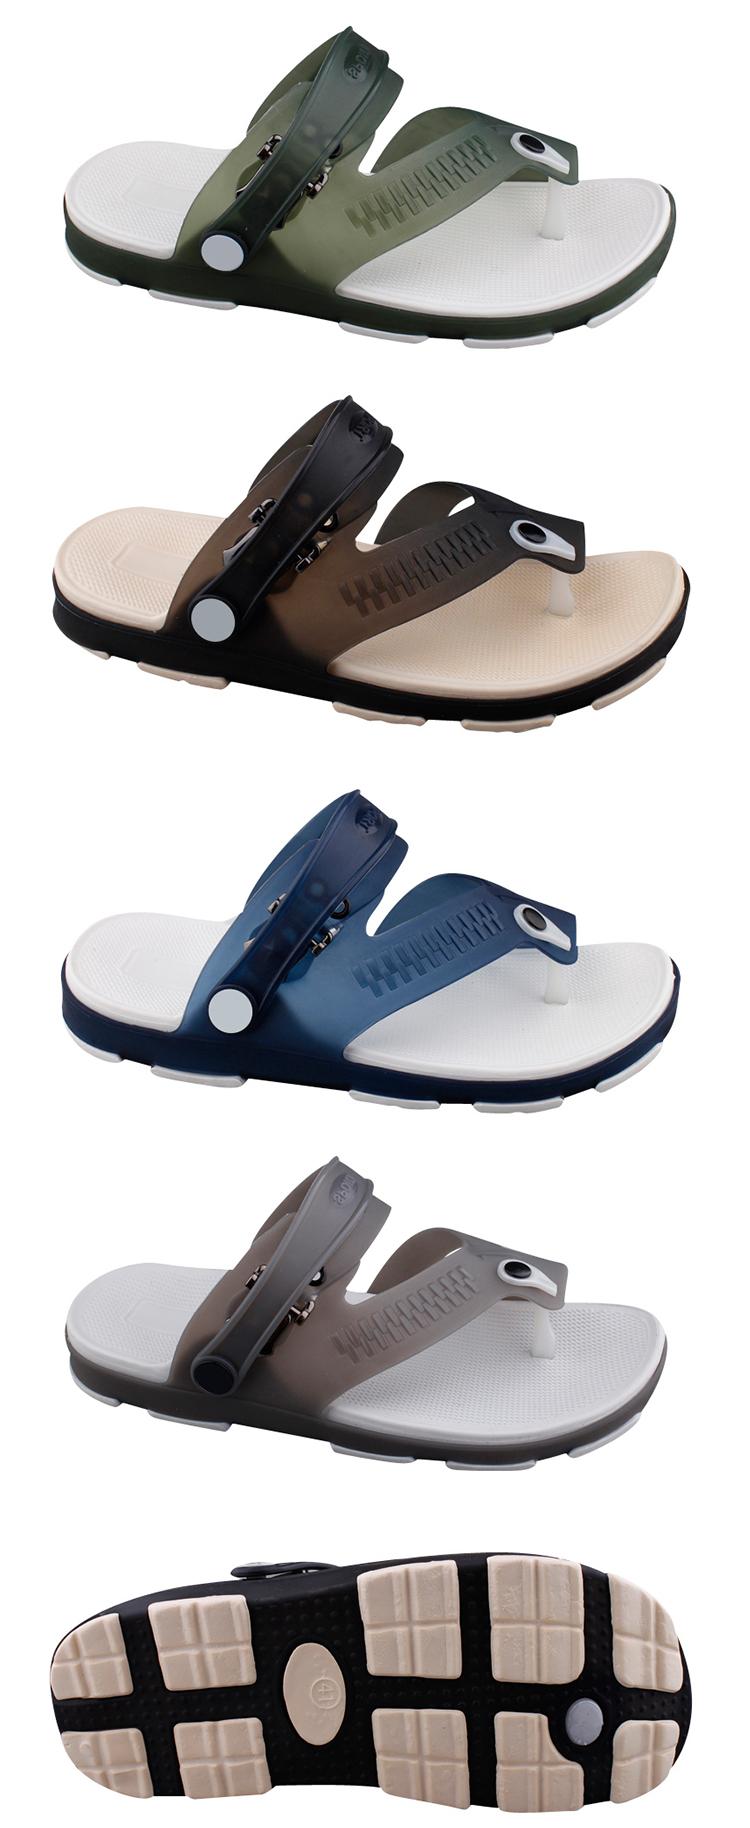 2ebeba77e New design men jelly shoes clear PVC flip flops beach thong sandals ...